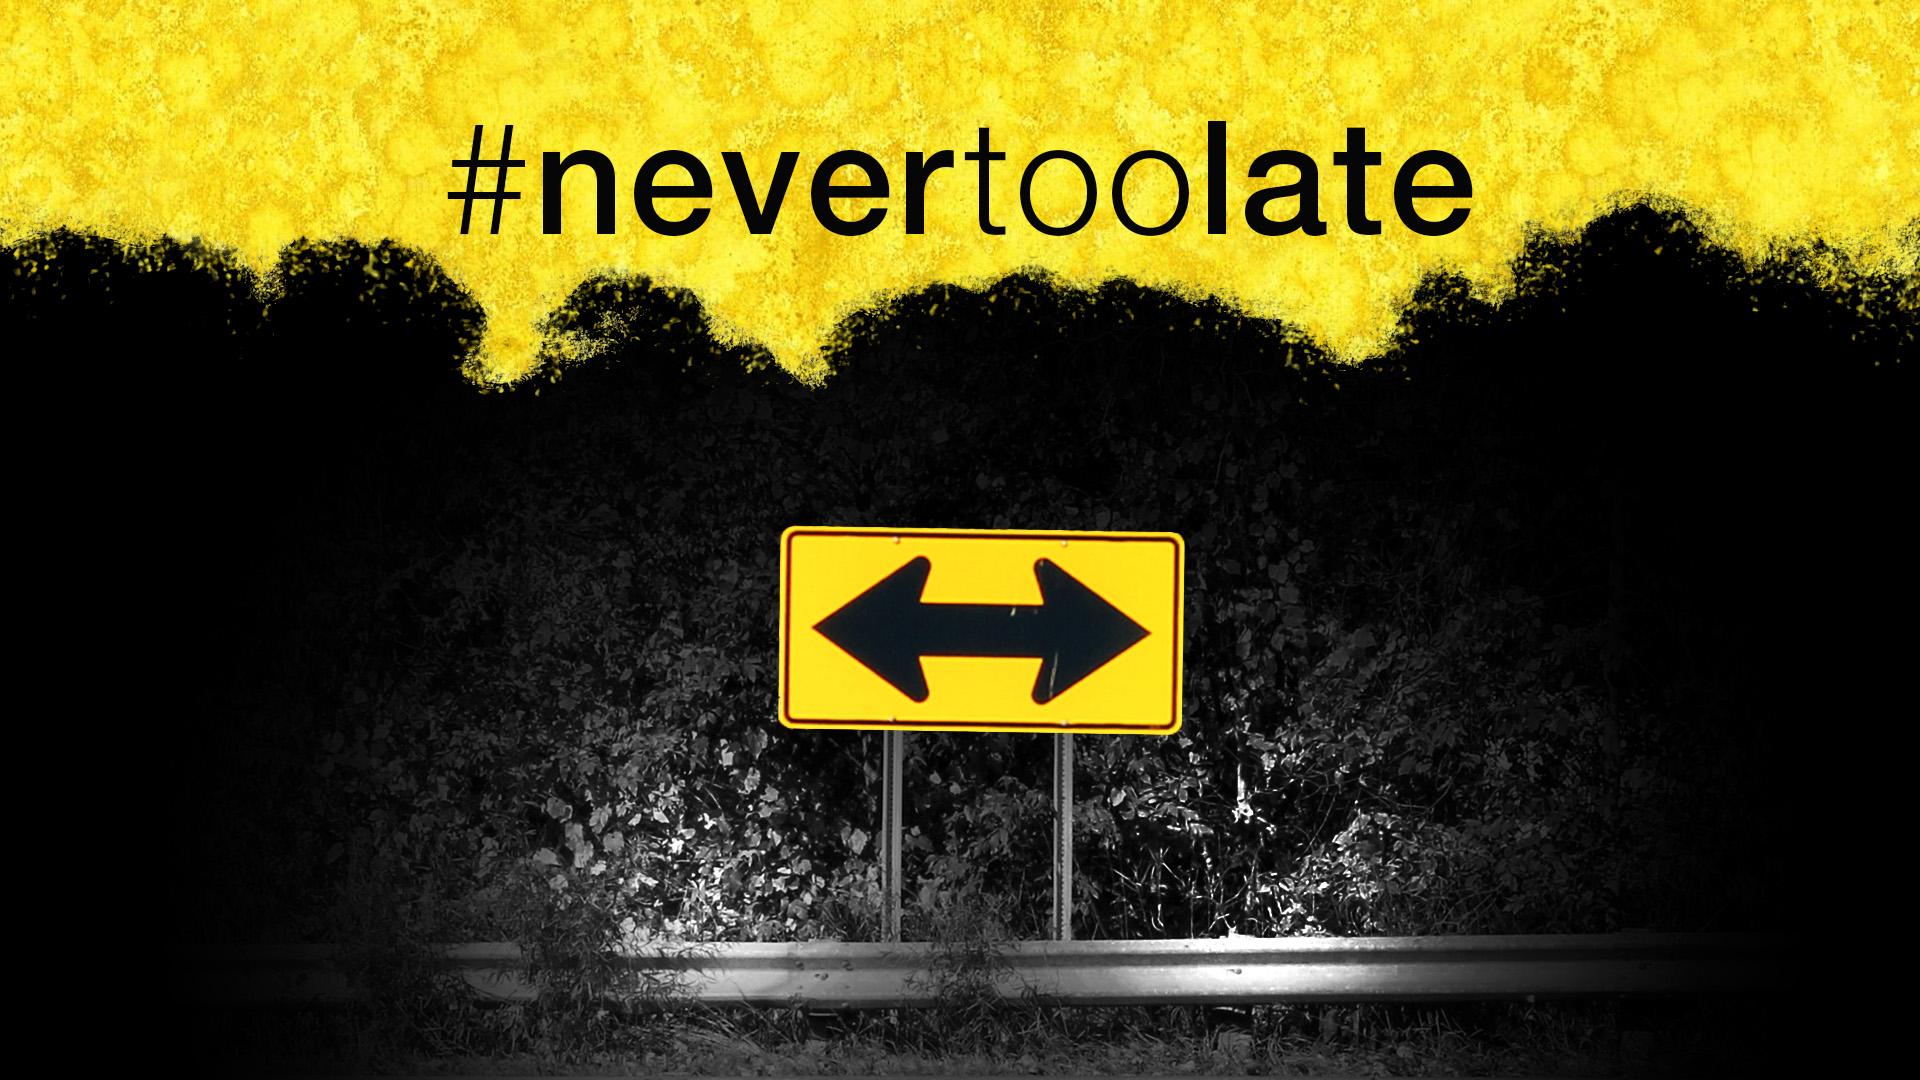 #NeverTooLate Image